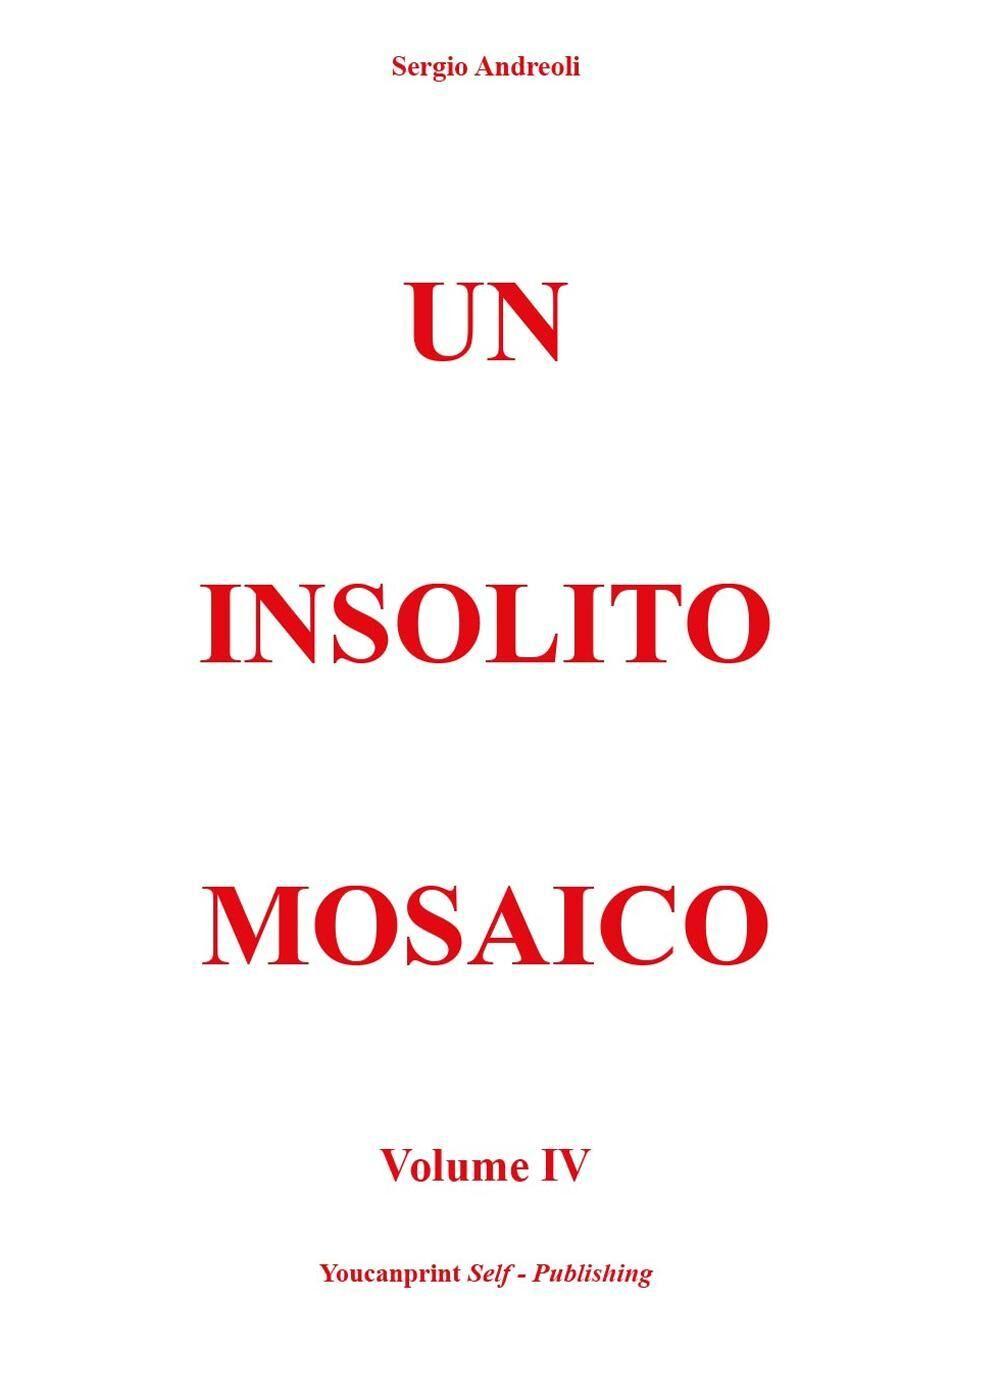 Un insolito mosaico. Vol. 4